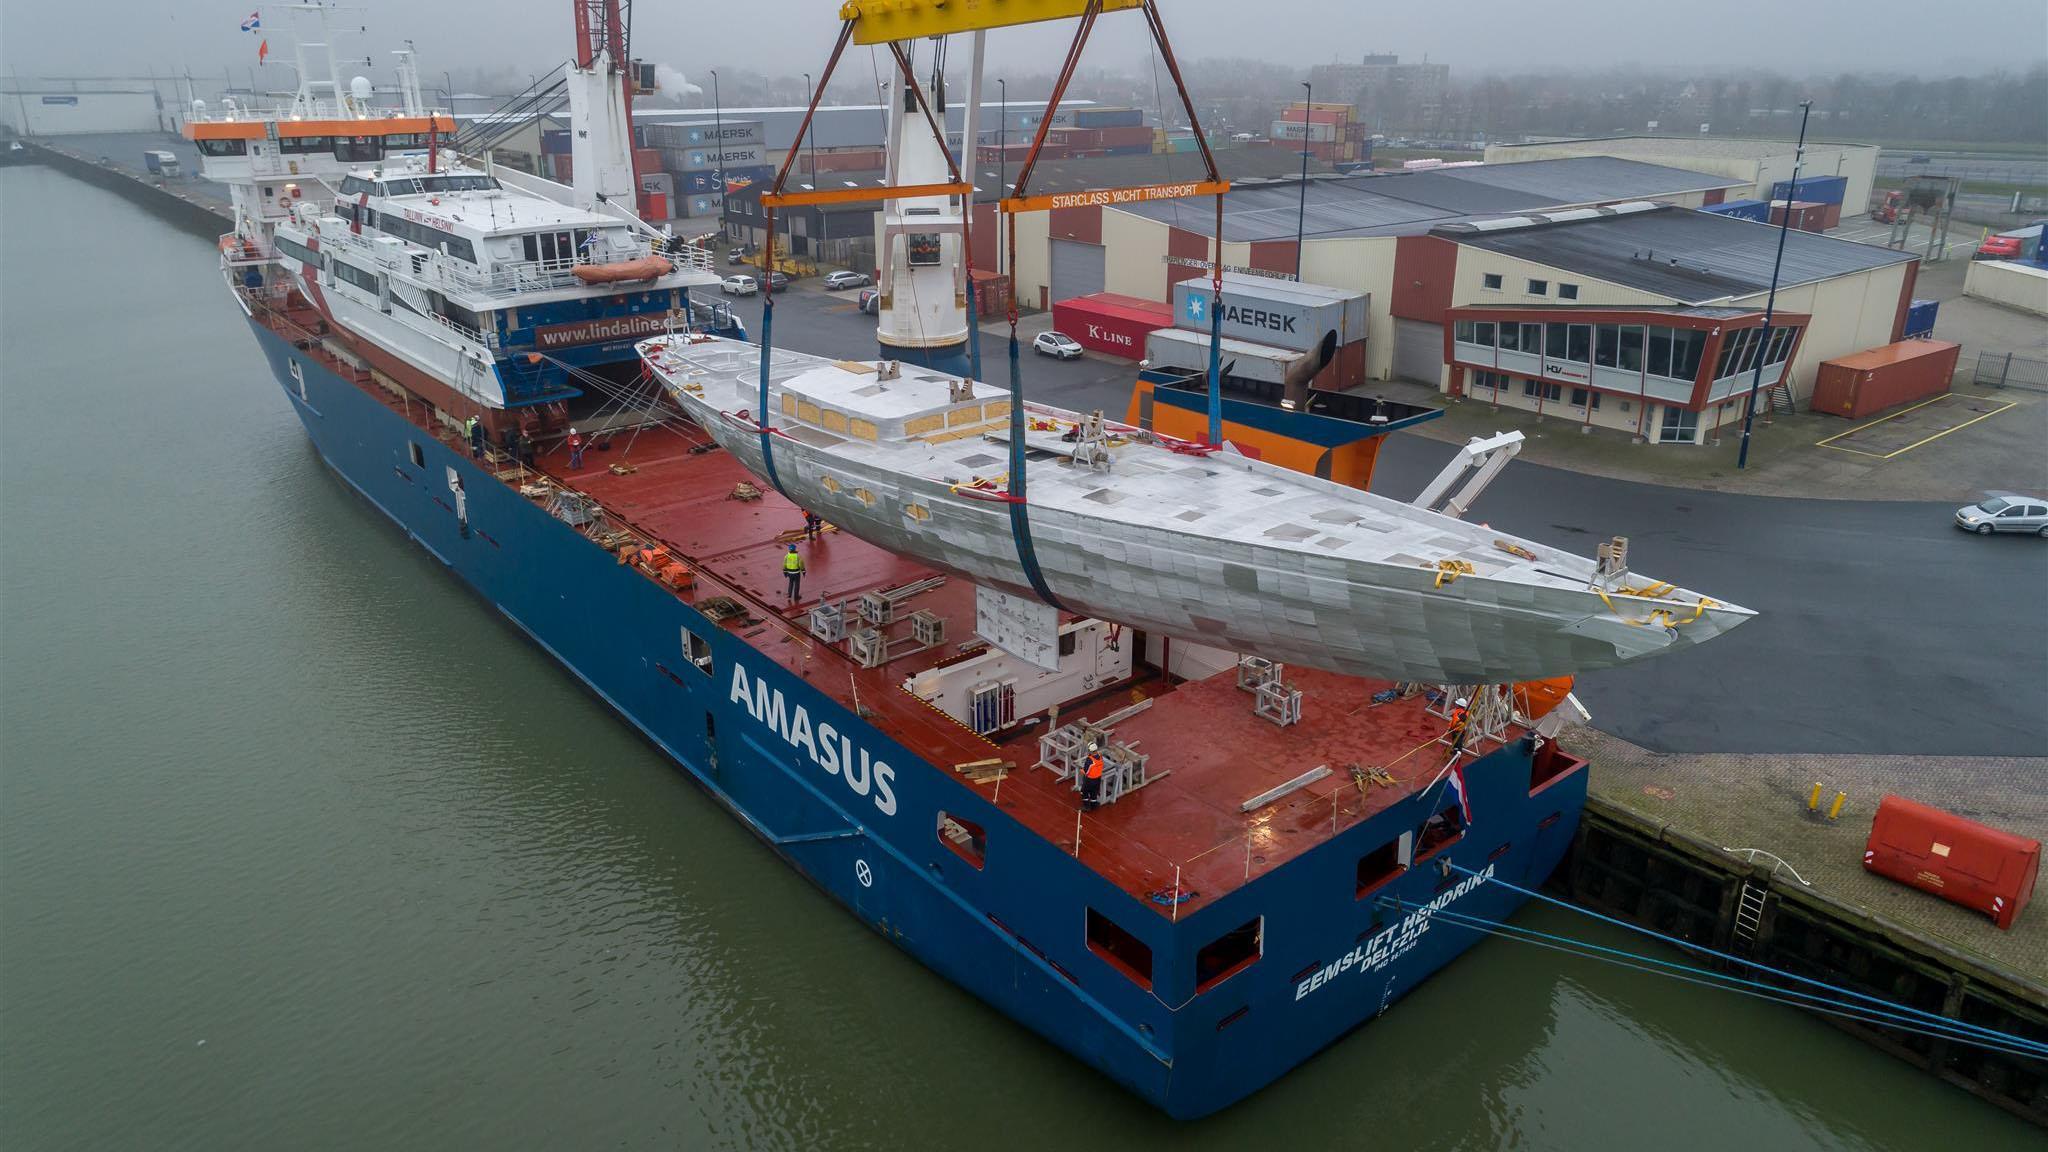 tc 128 sailing yachts ses yachts 39m 2019 hull shipped to turkey